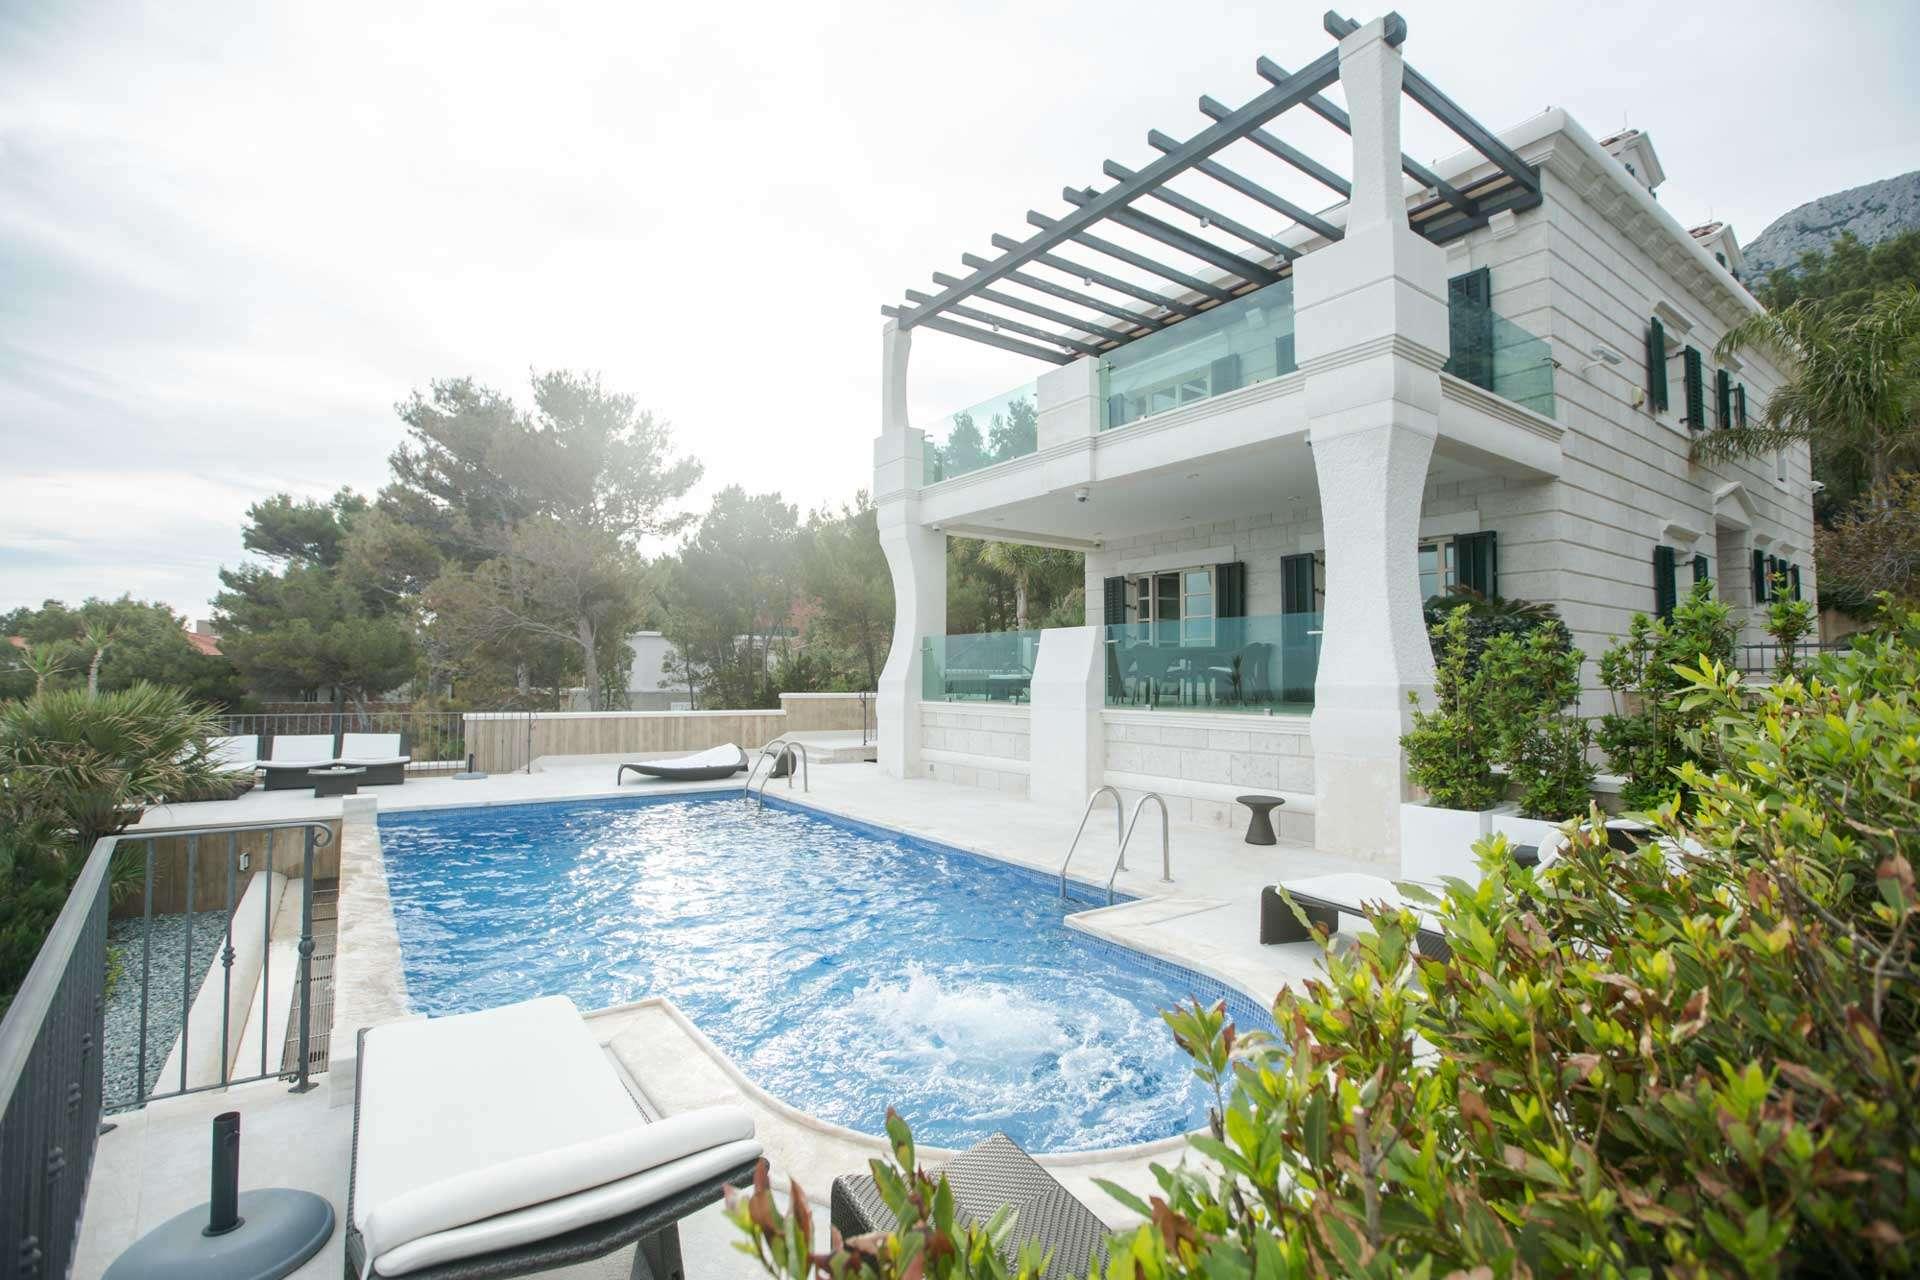 Luxury vacation rentals europe - Croatia - Hvar island - Sveta nedilja - Sancta Domenica - Image 1/98